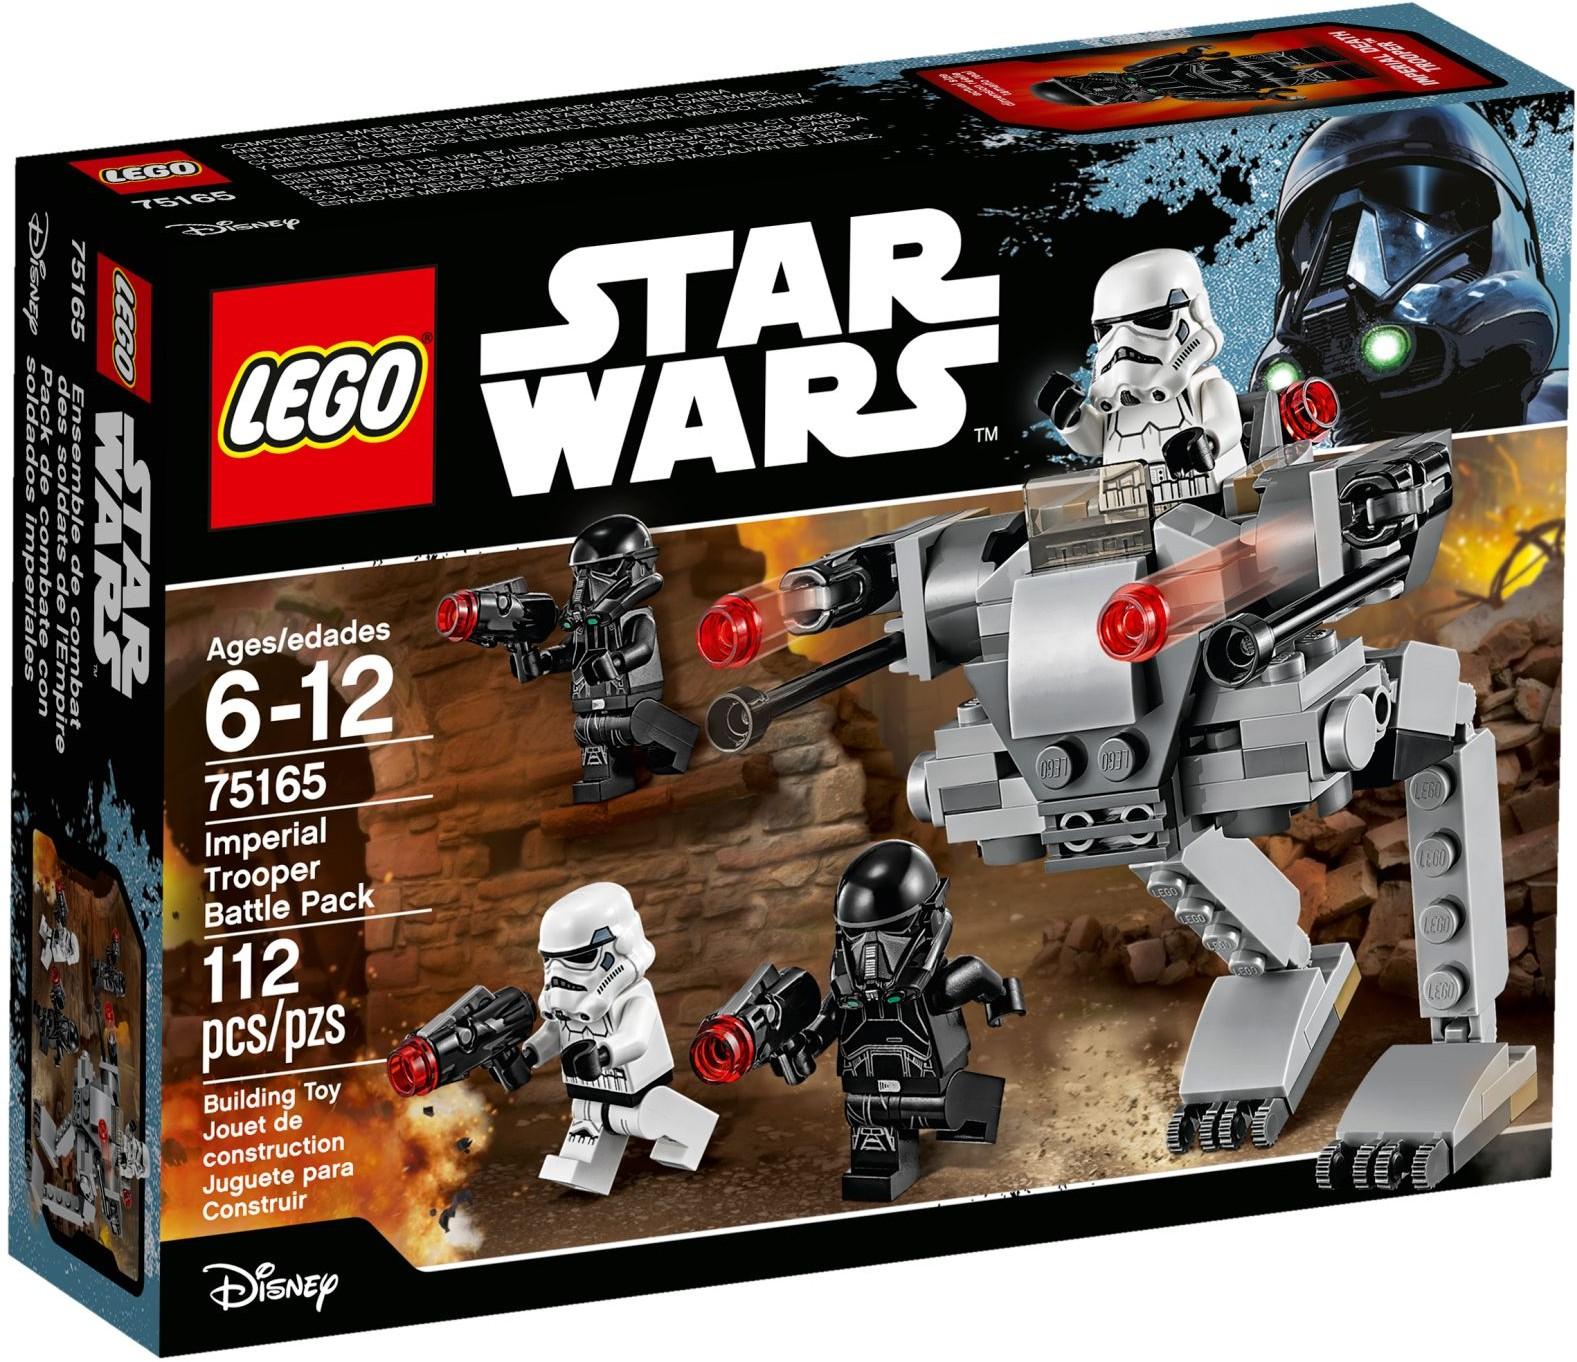 Jual Lego Star Wars 75165 Imperial Trooper Battle Pack Kota